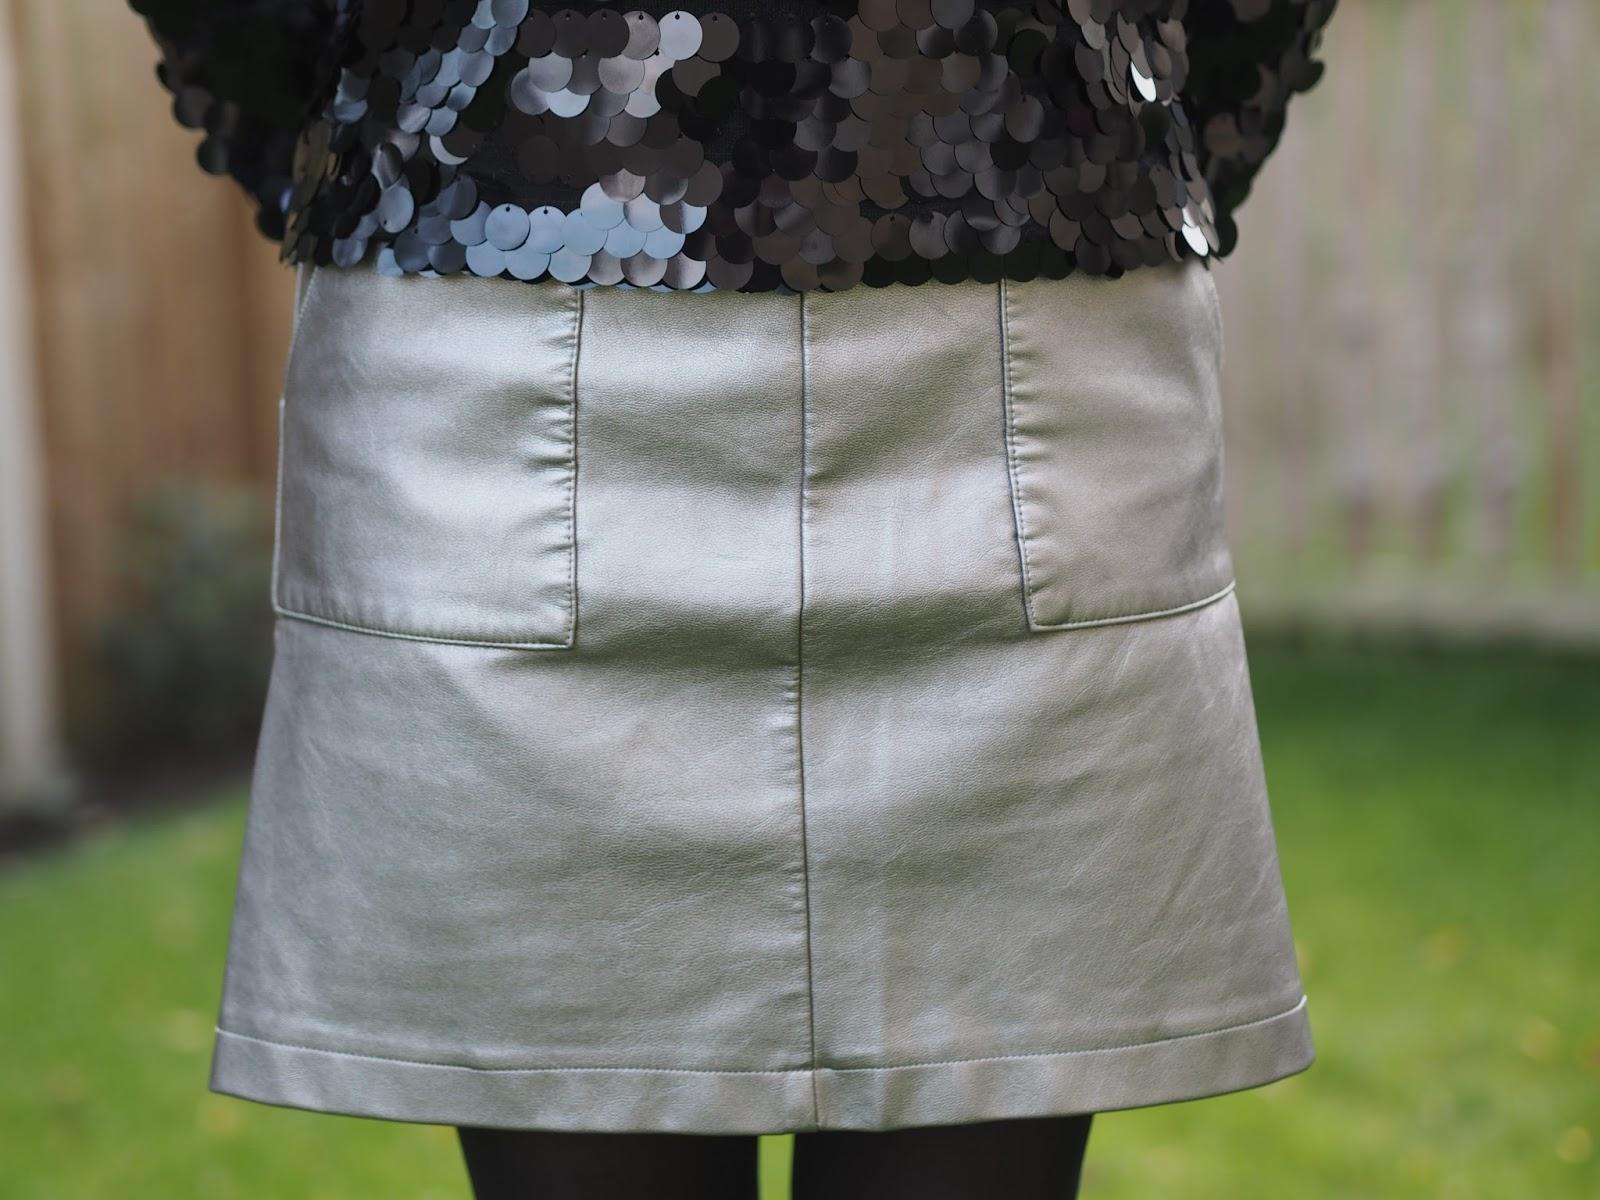 Black paillette sequin sweatshirt, metallic faux leather skirt, ankle boots, over 40